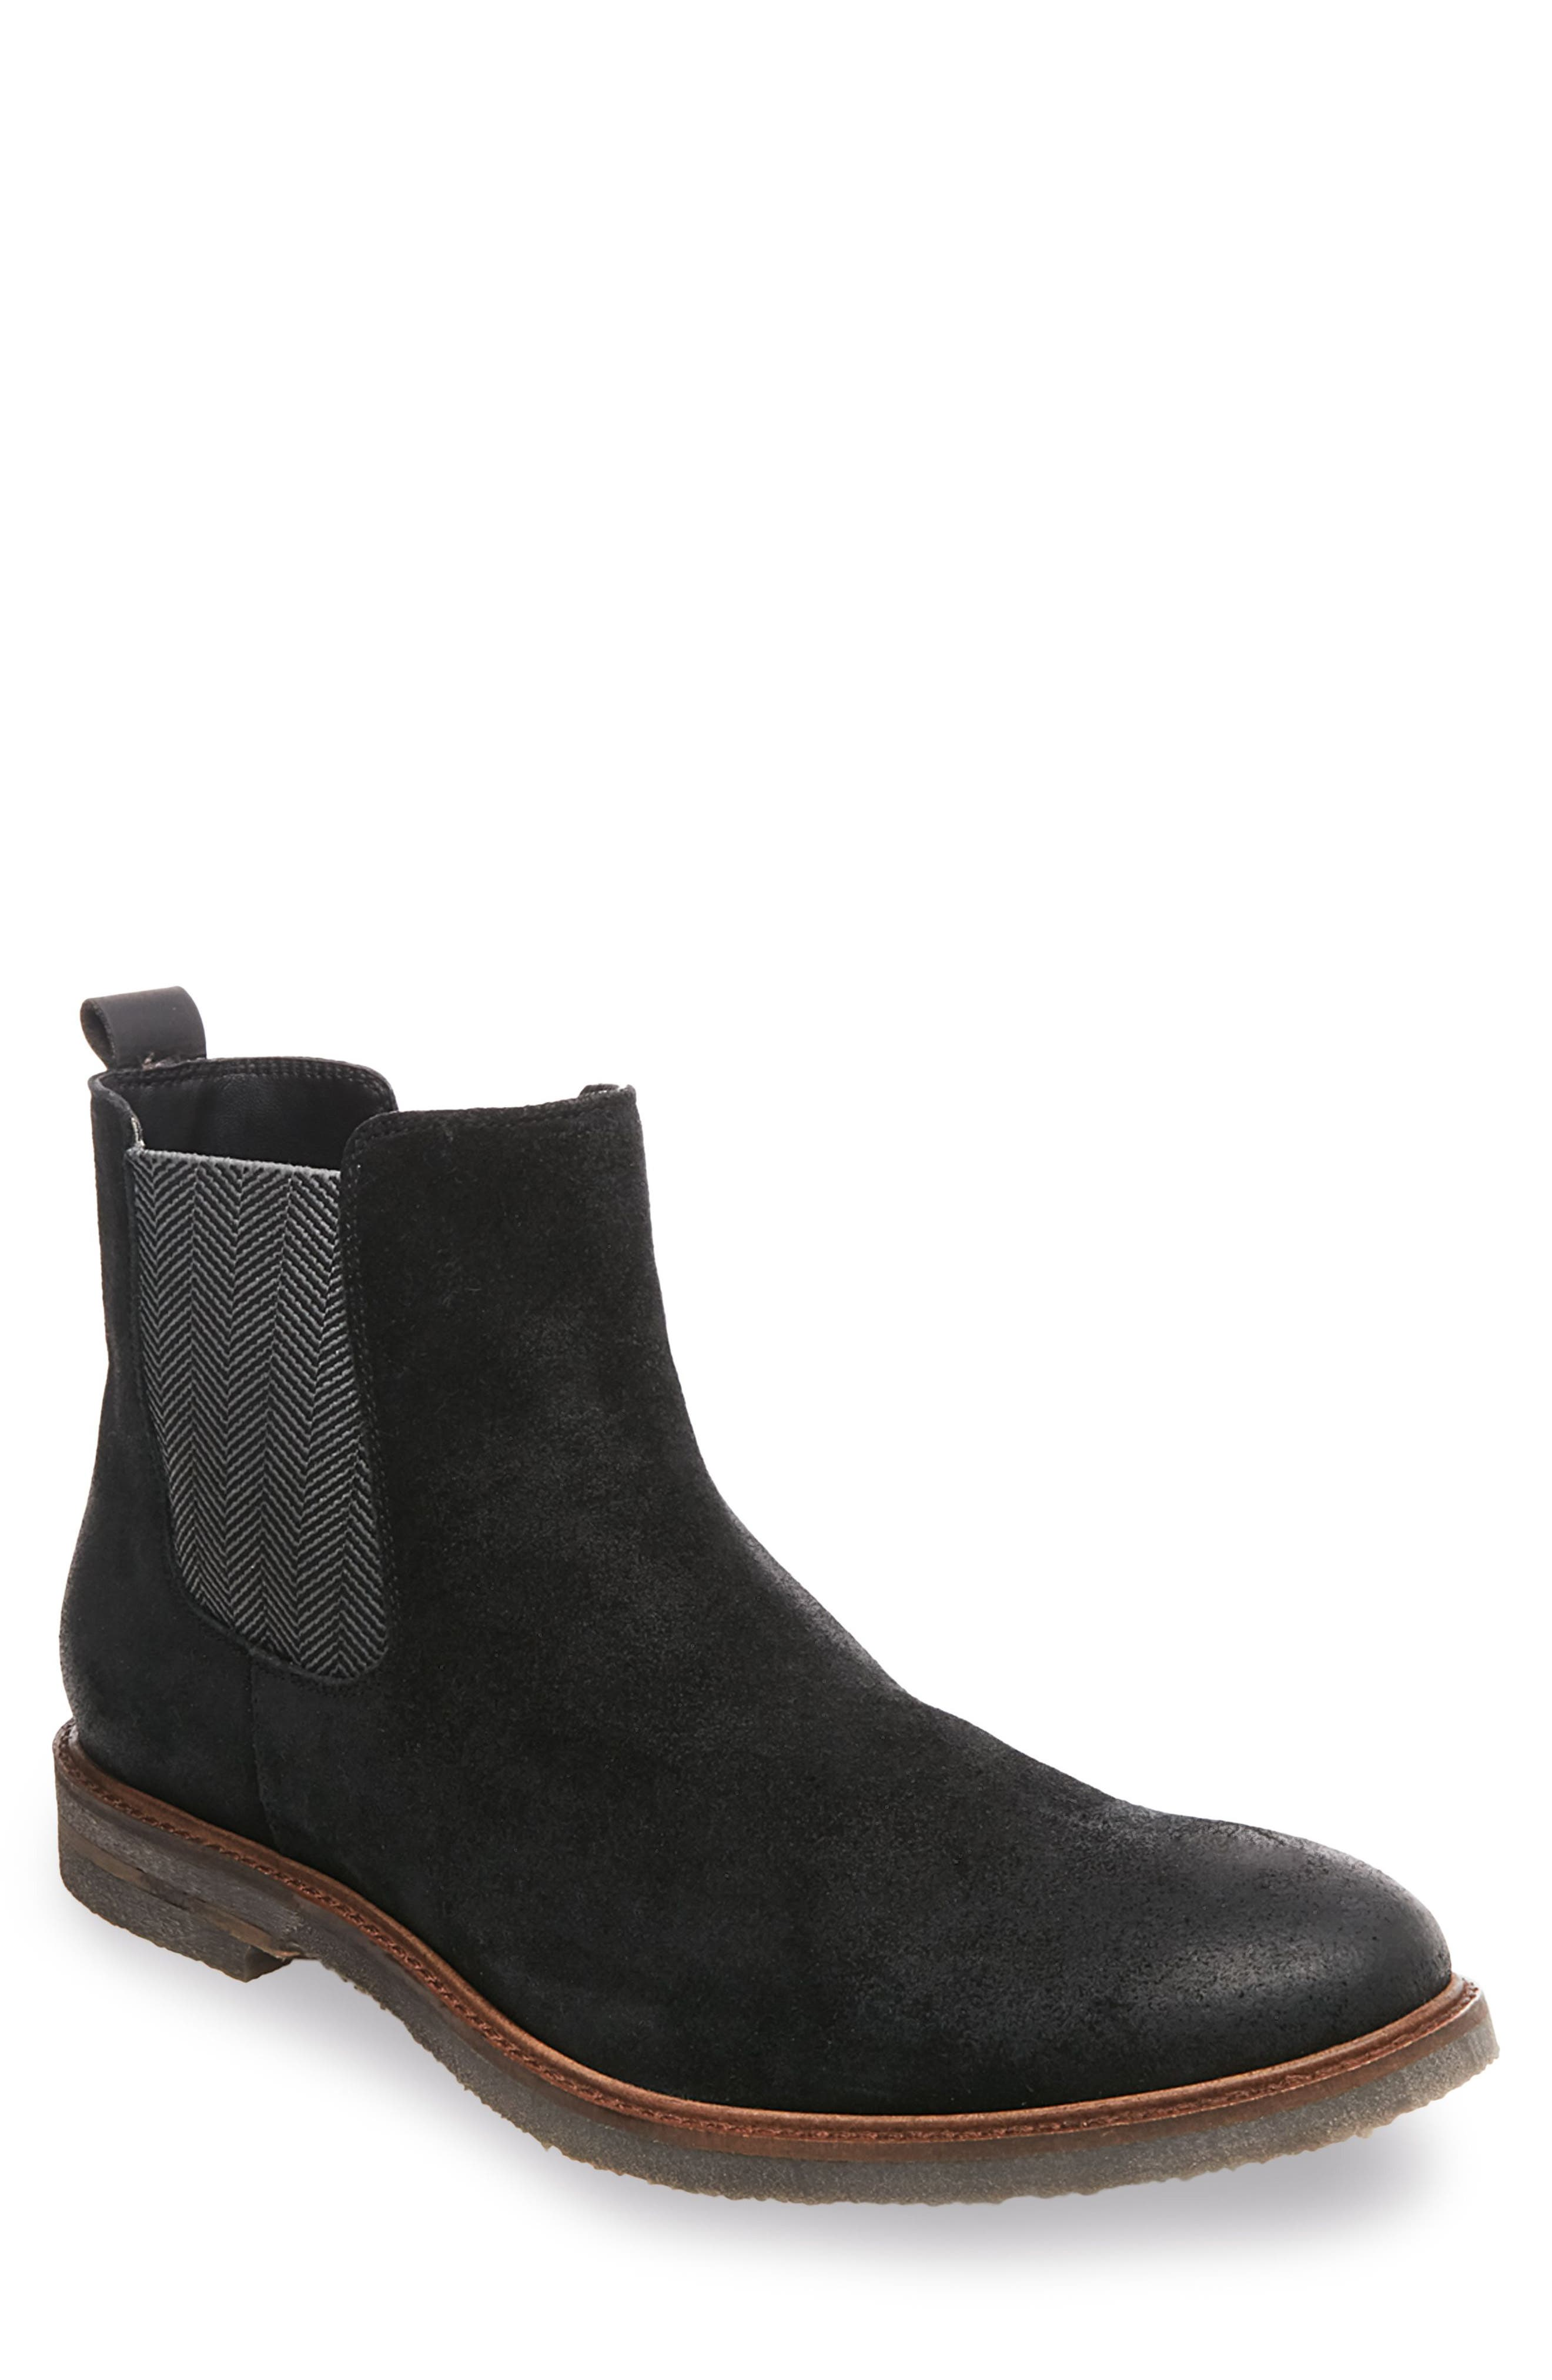 Teller Chelsea Boot,                         Main,                         color, 006